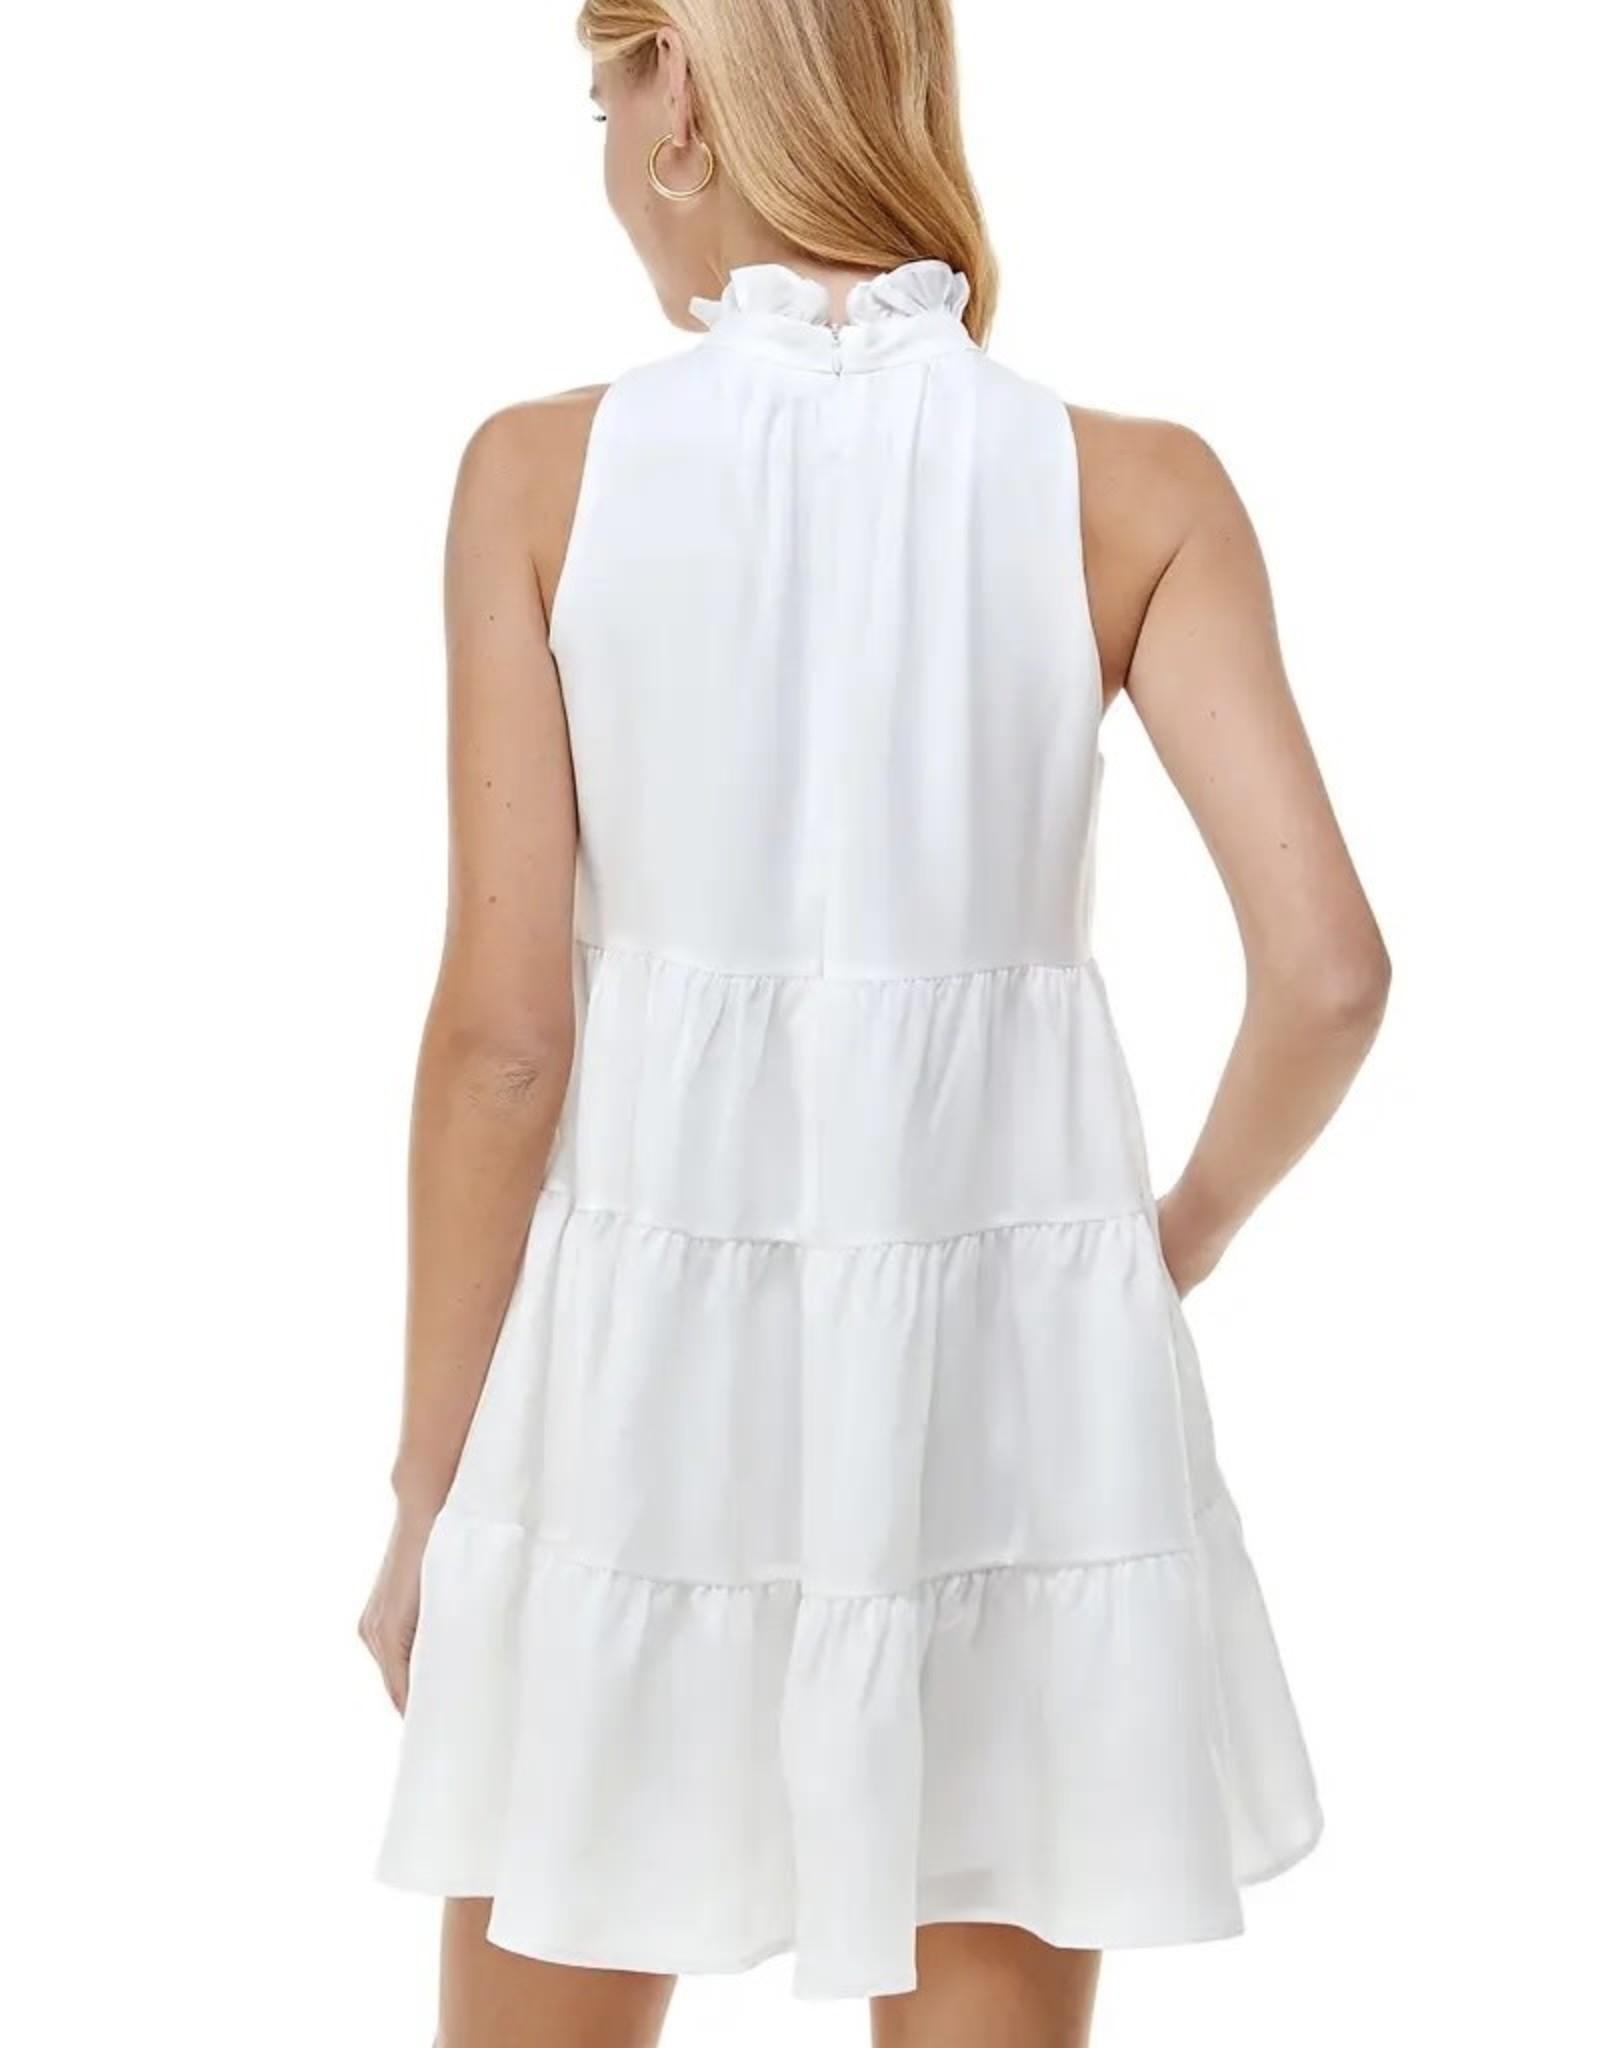 The Hampton's Dress